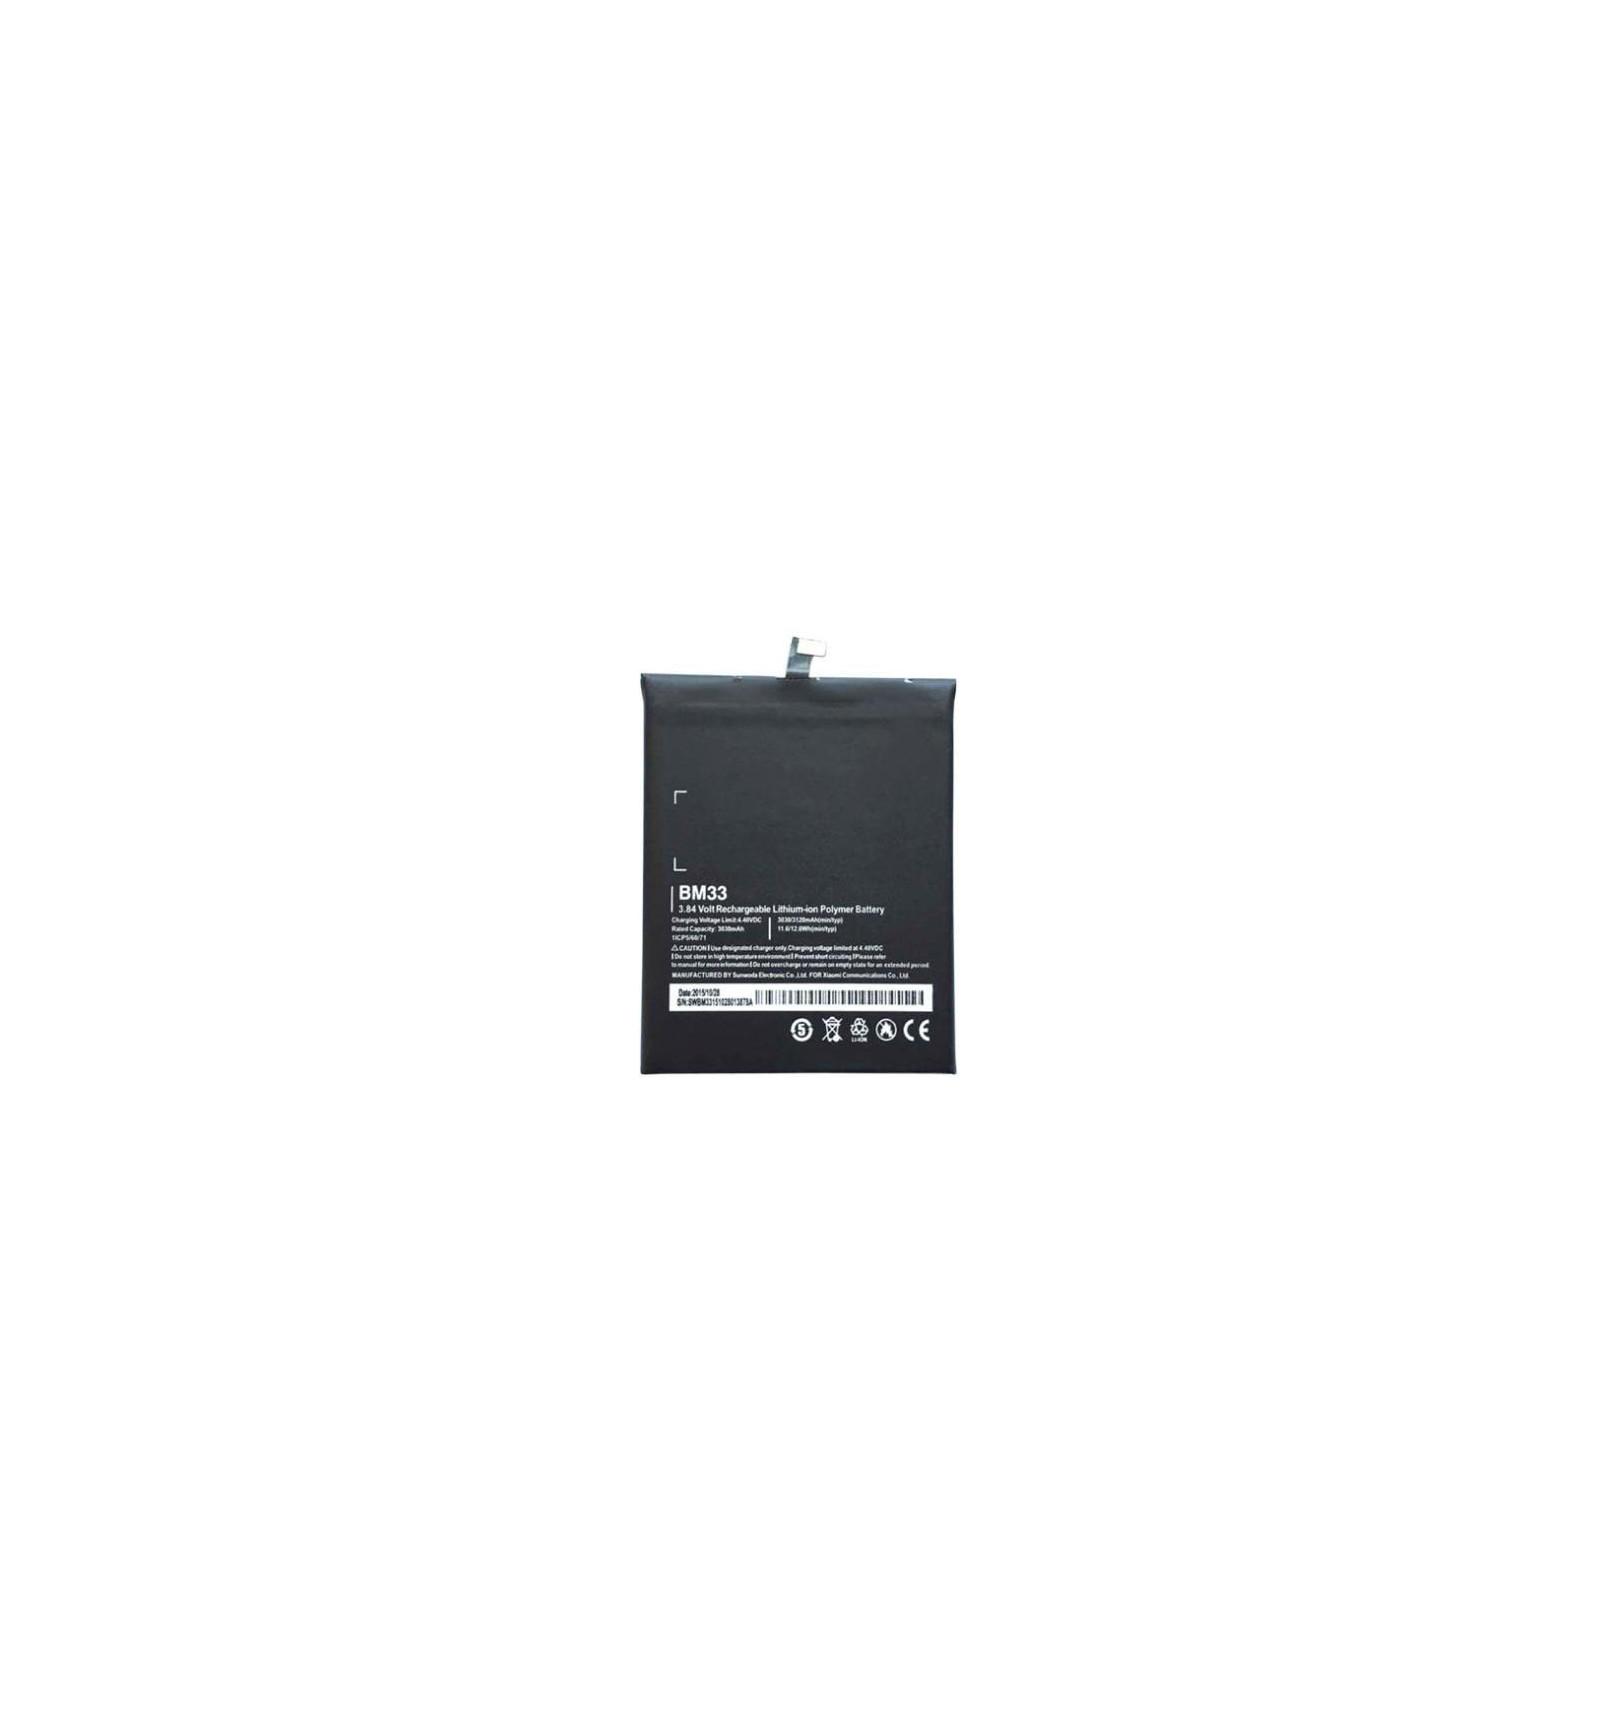 Harga Dan Spek Baterai Xiaomi Mi4i Bm33 Termurah 2018 Rakkipanda Battery Bm 33 For Mi 4i Mi41 Original Hitam Review